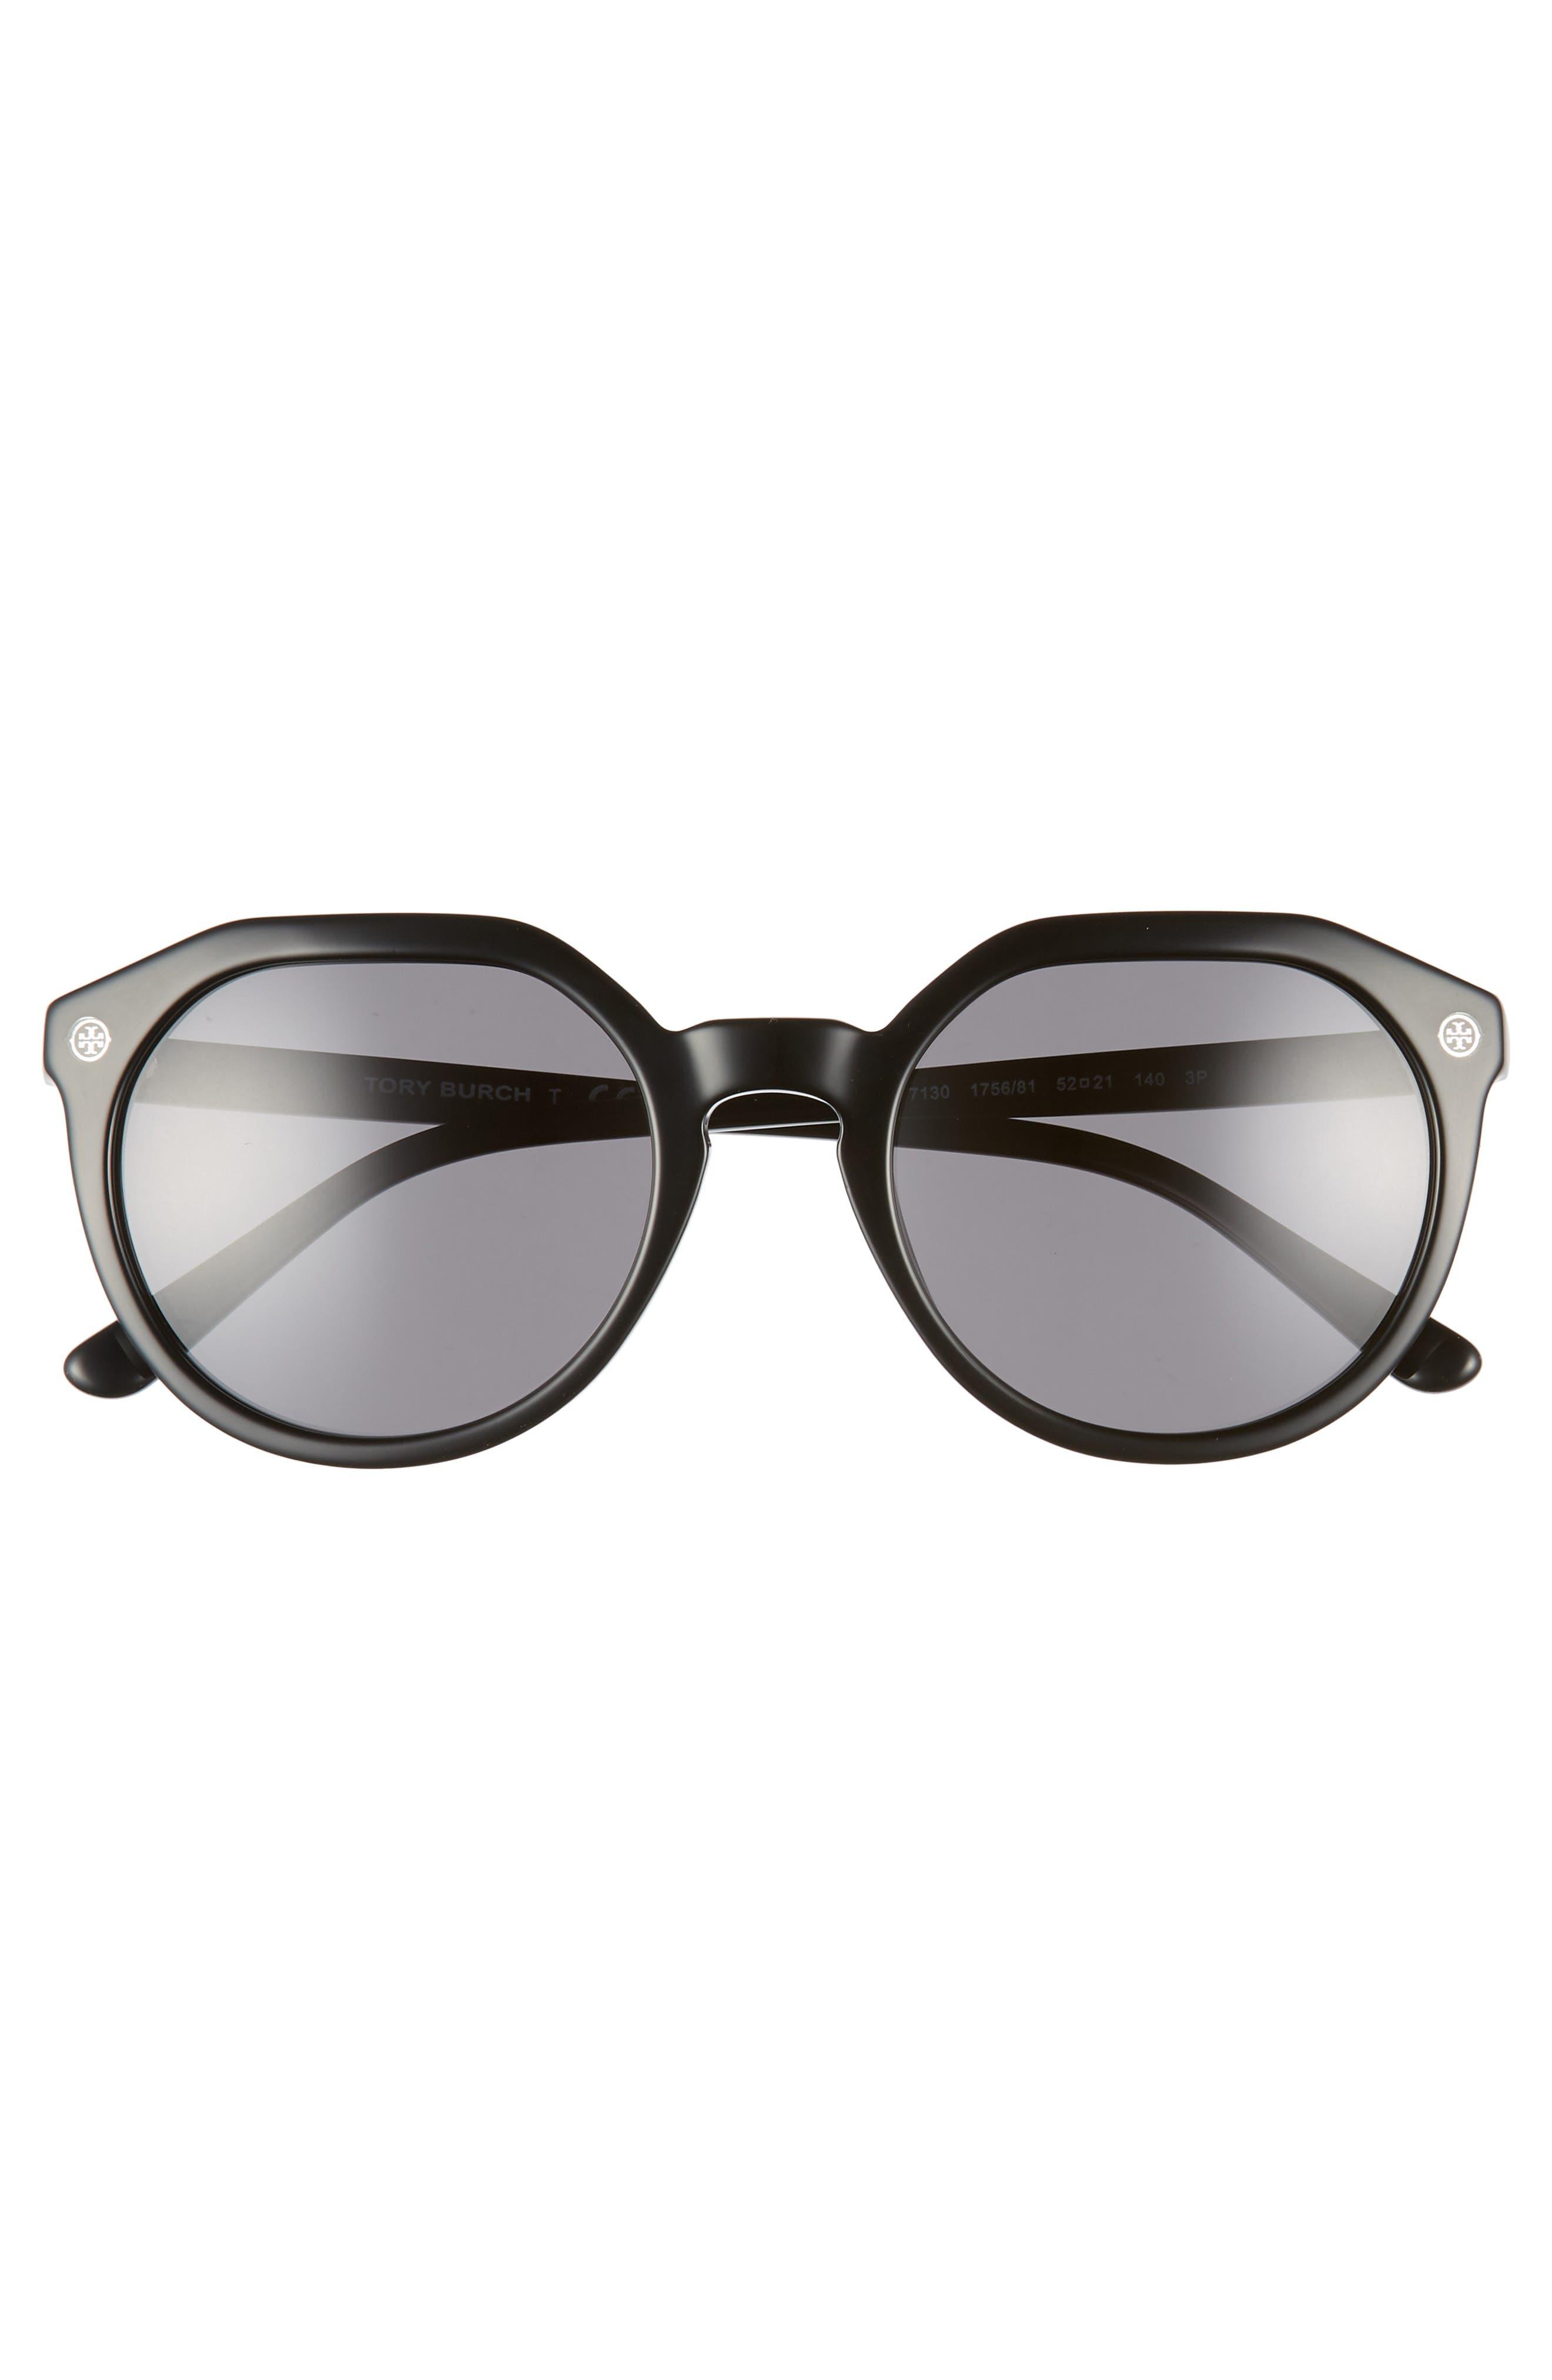 0704c8644bead Women s Sunglasses Sale